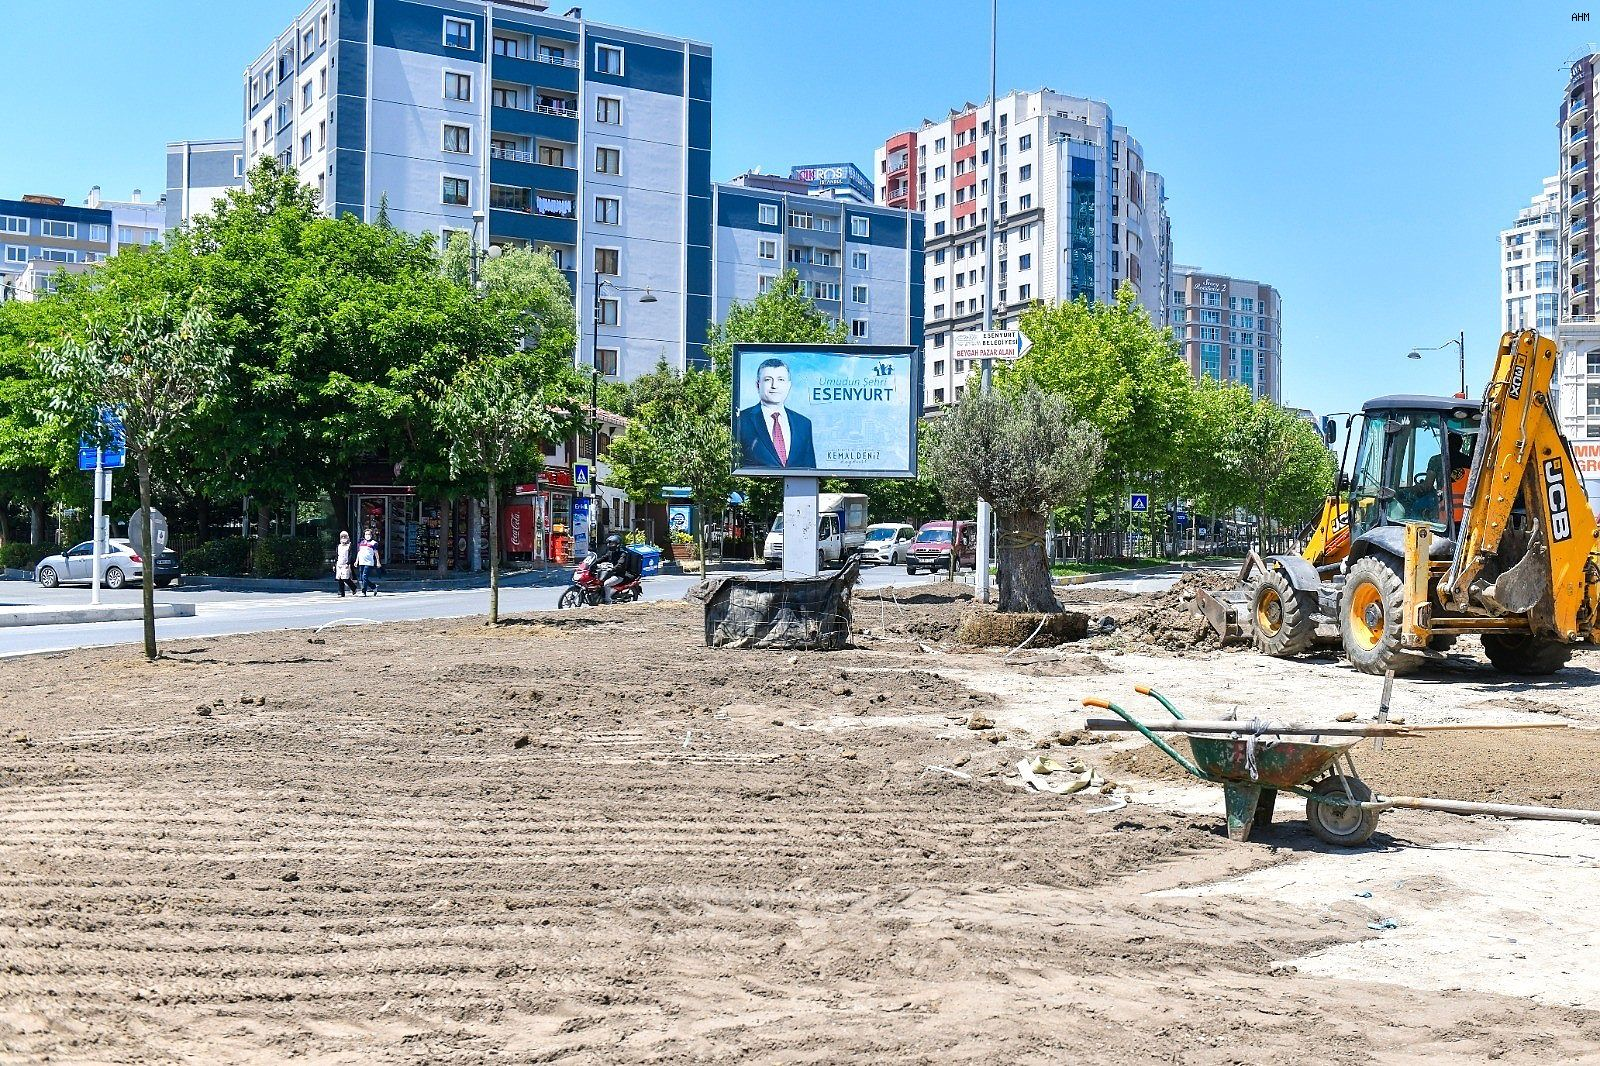 2021/06/esenyurt-belediyesi-ilceye-yuz-yillik-zeytin-agaclari-dikti-20210610AW34-2.jpg